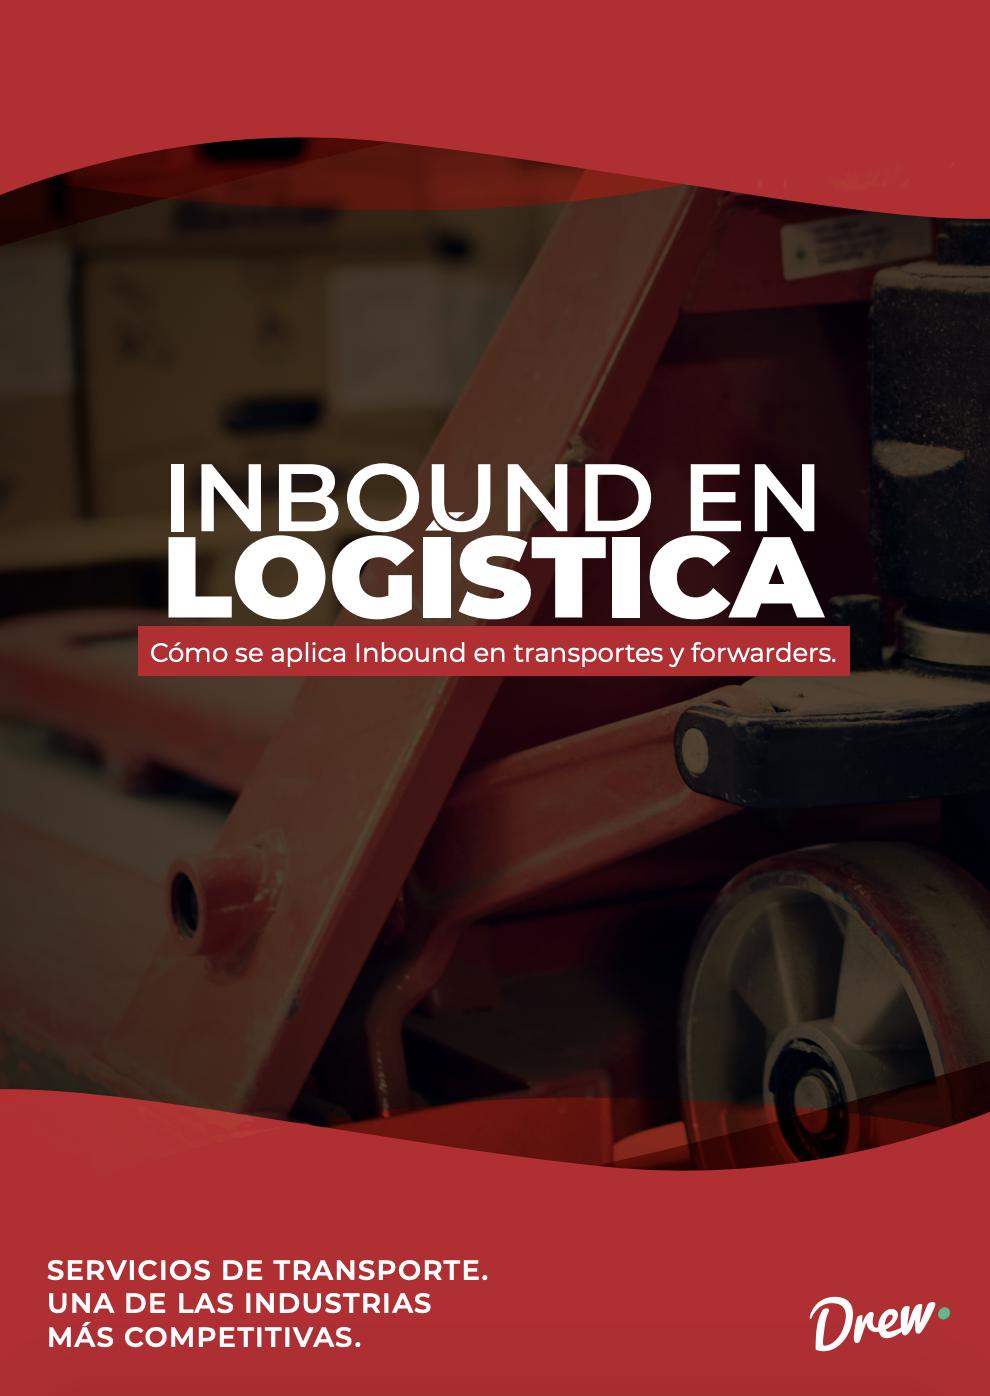 Inbound en logística